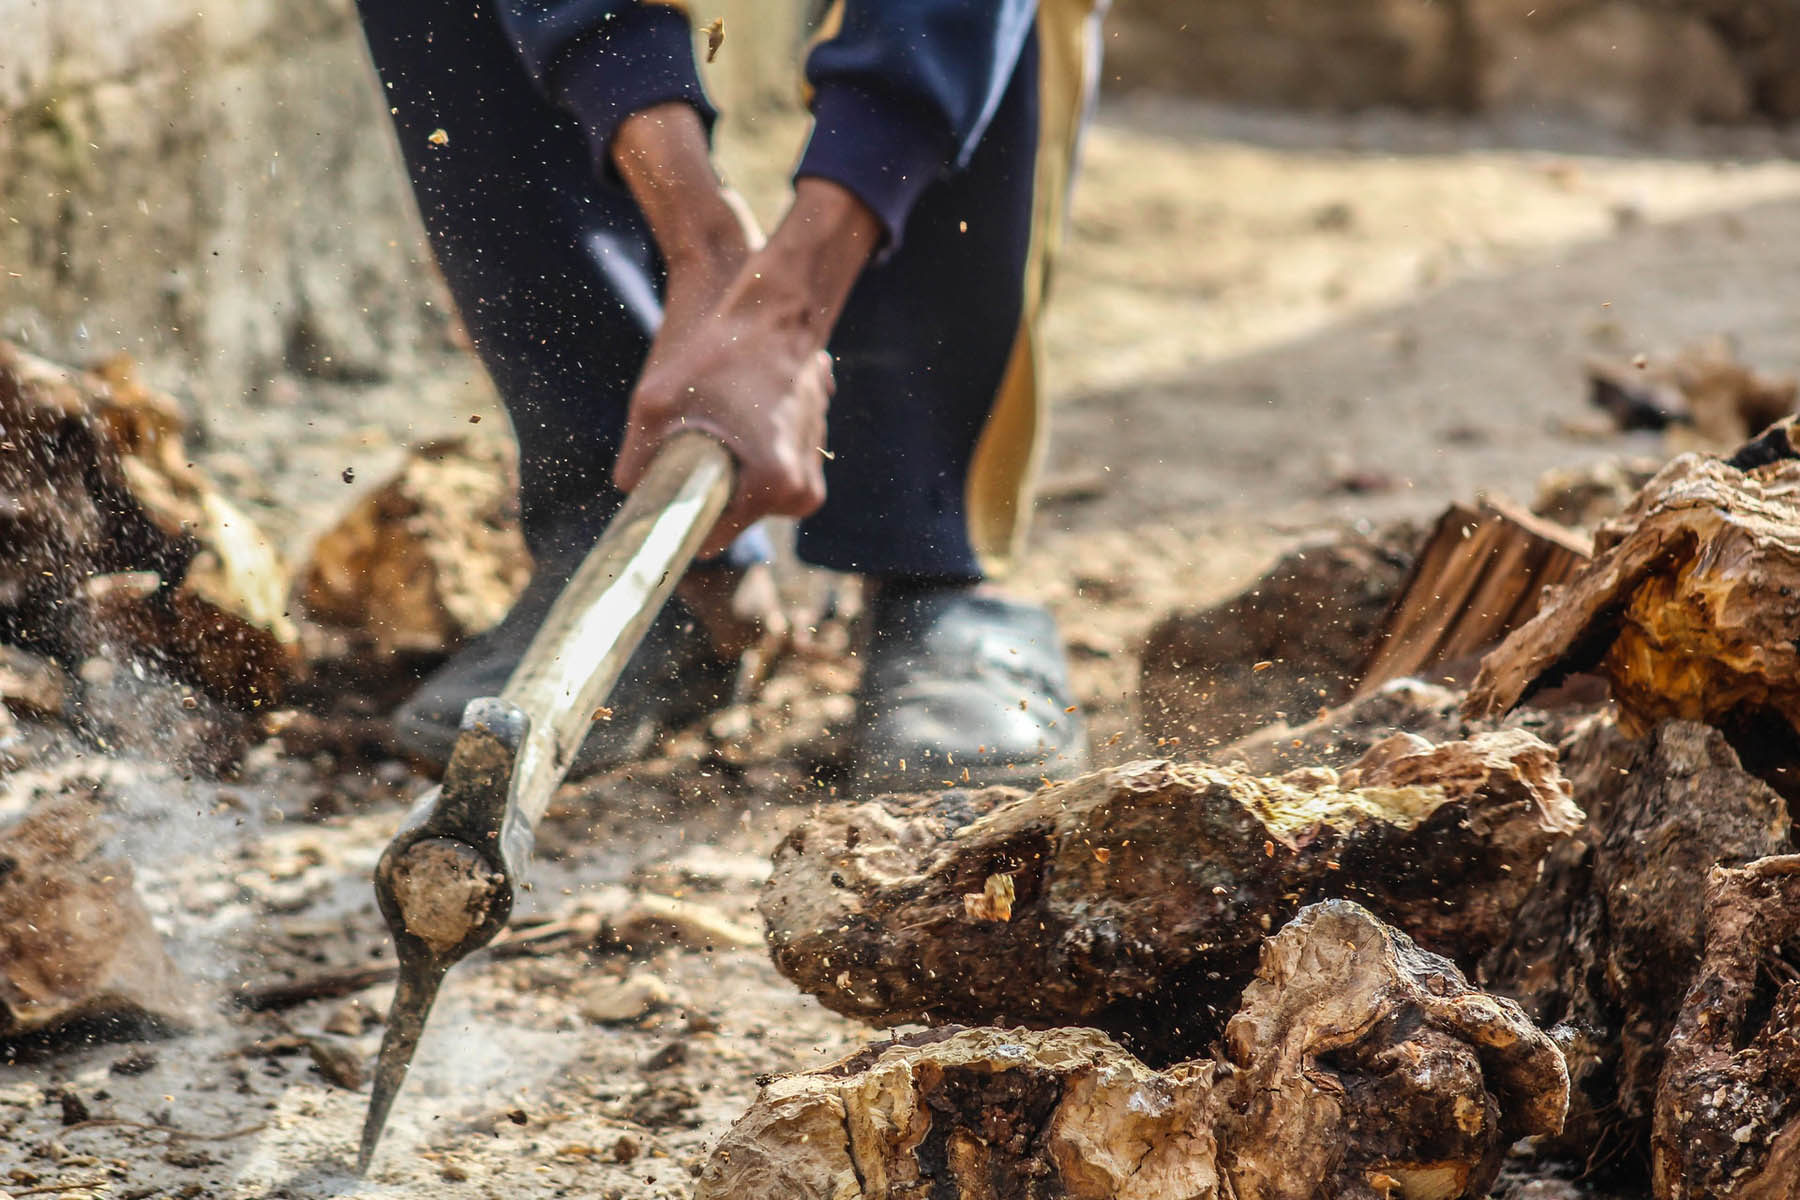 man-axe-lumber-work.jpg